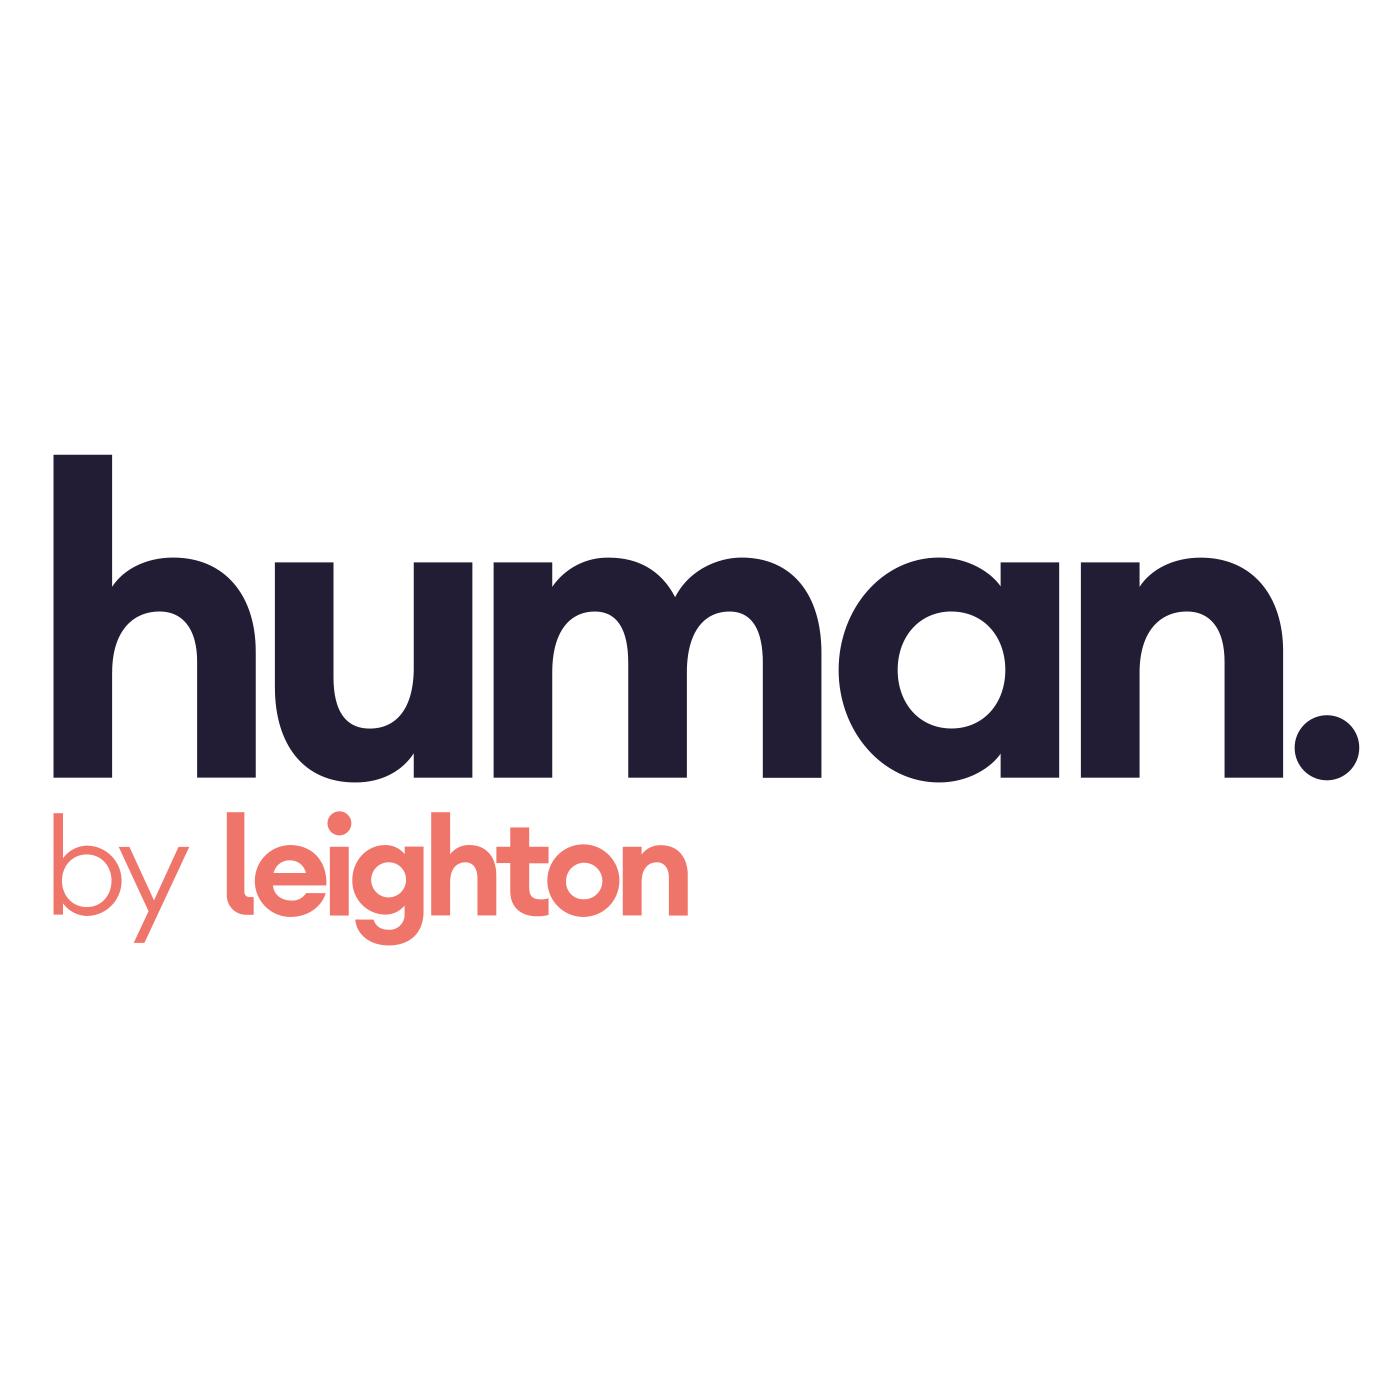 Human by Leighton